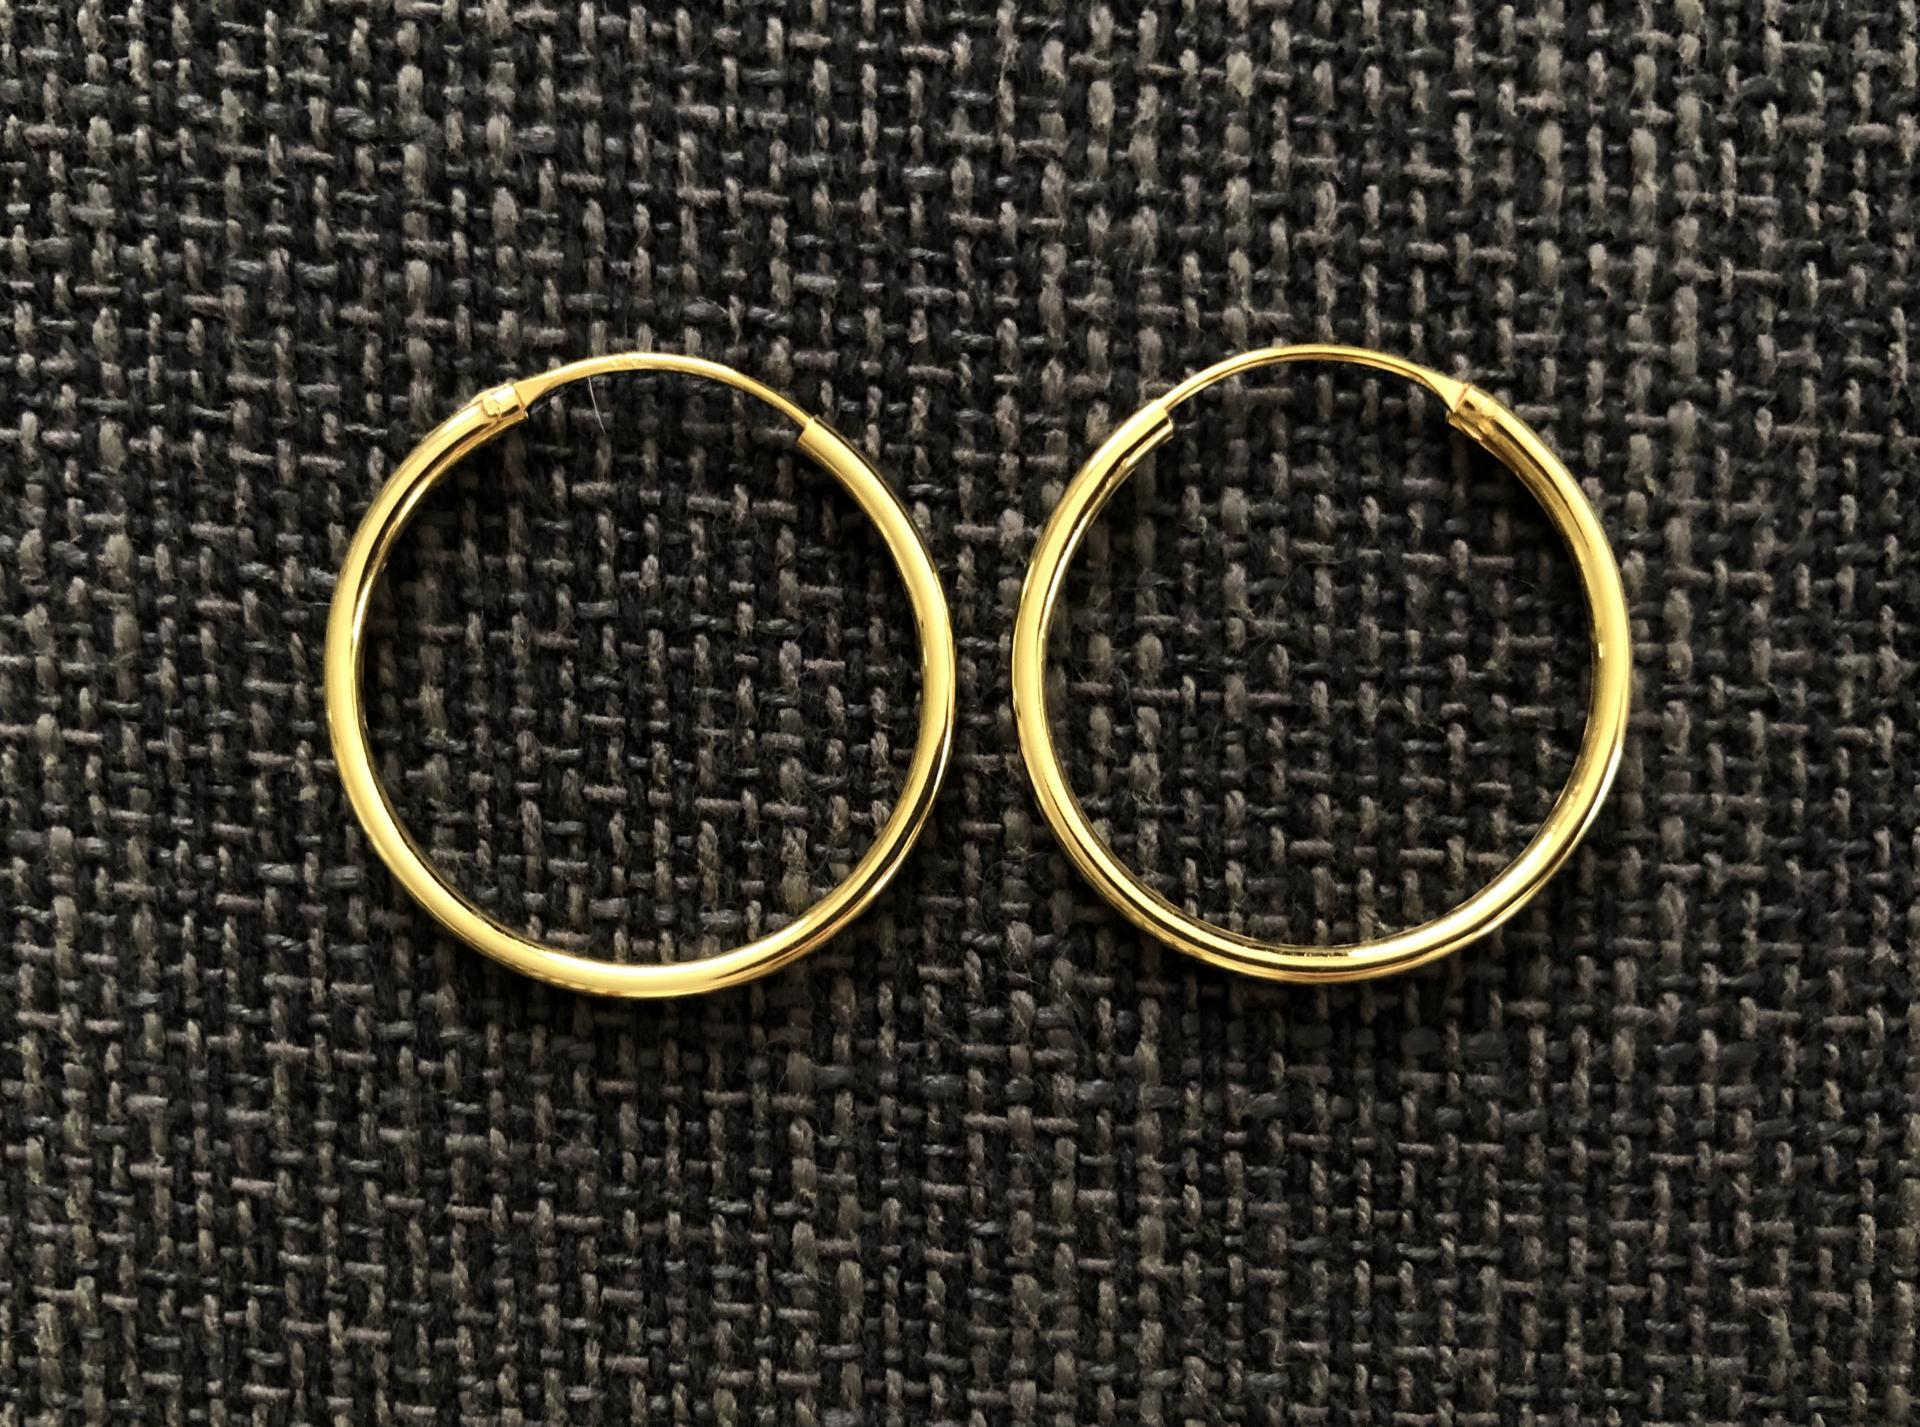 Aros de plata con baño de oro 30 mm grueso